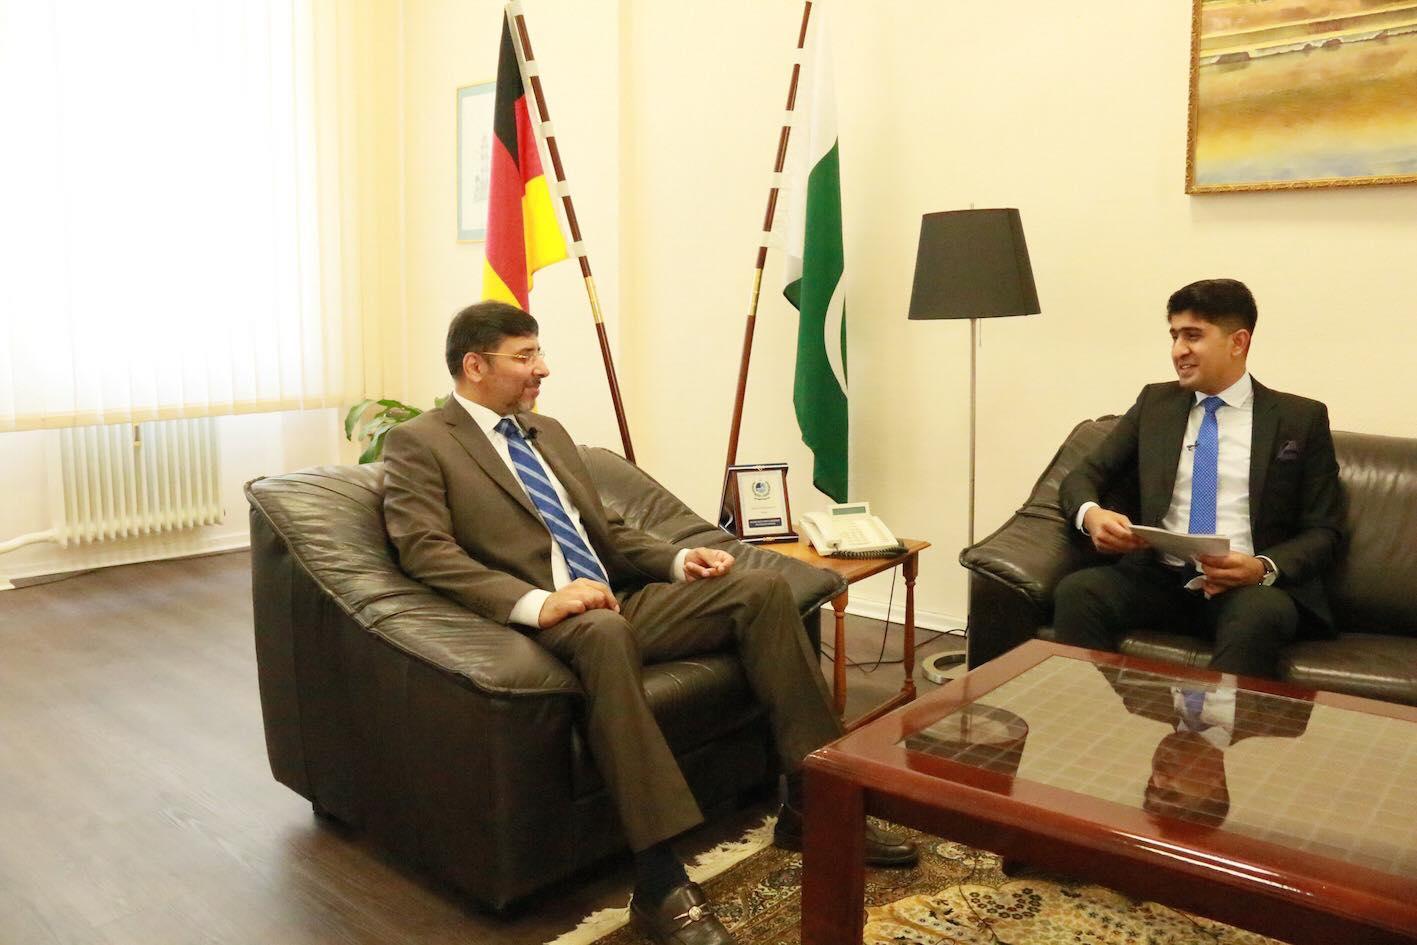 Pakistan Ambassador to Germany Jauhar Saleem